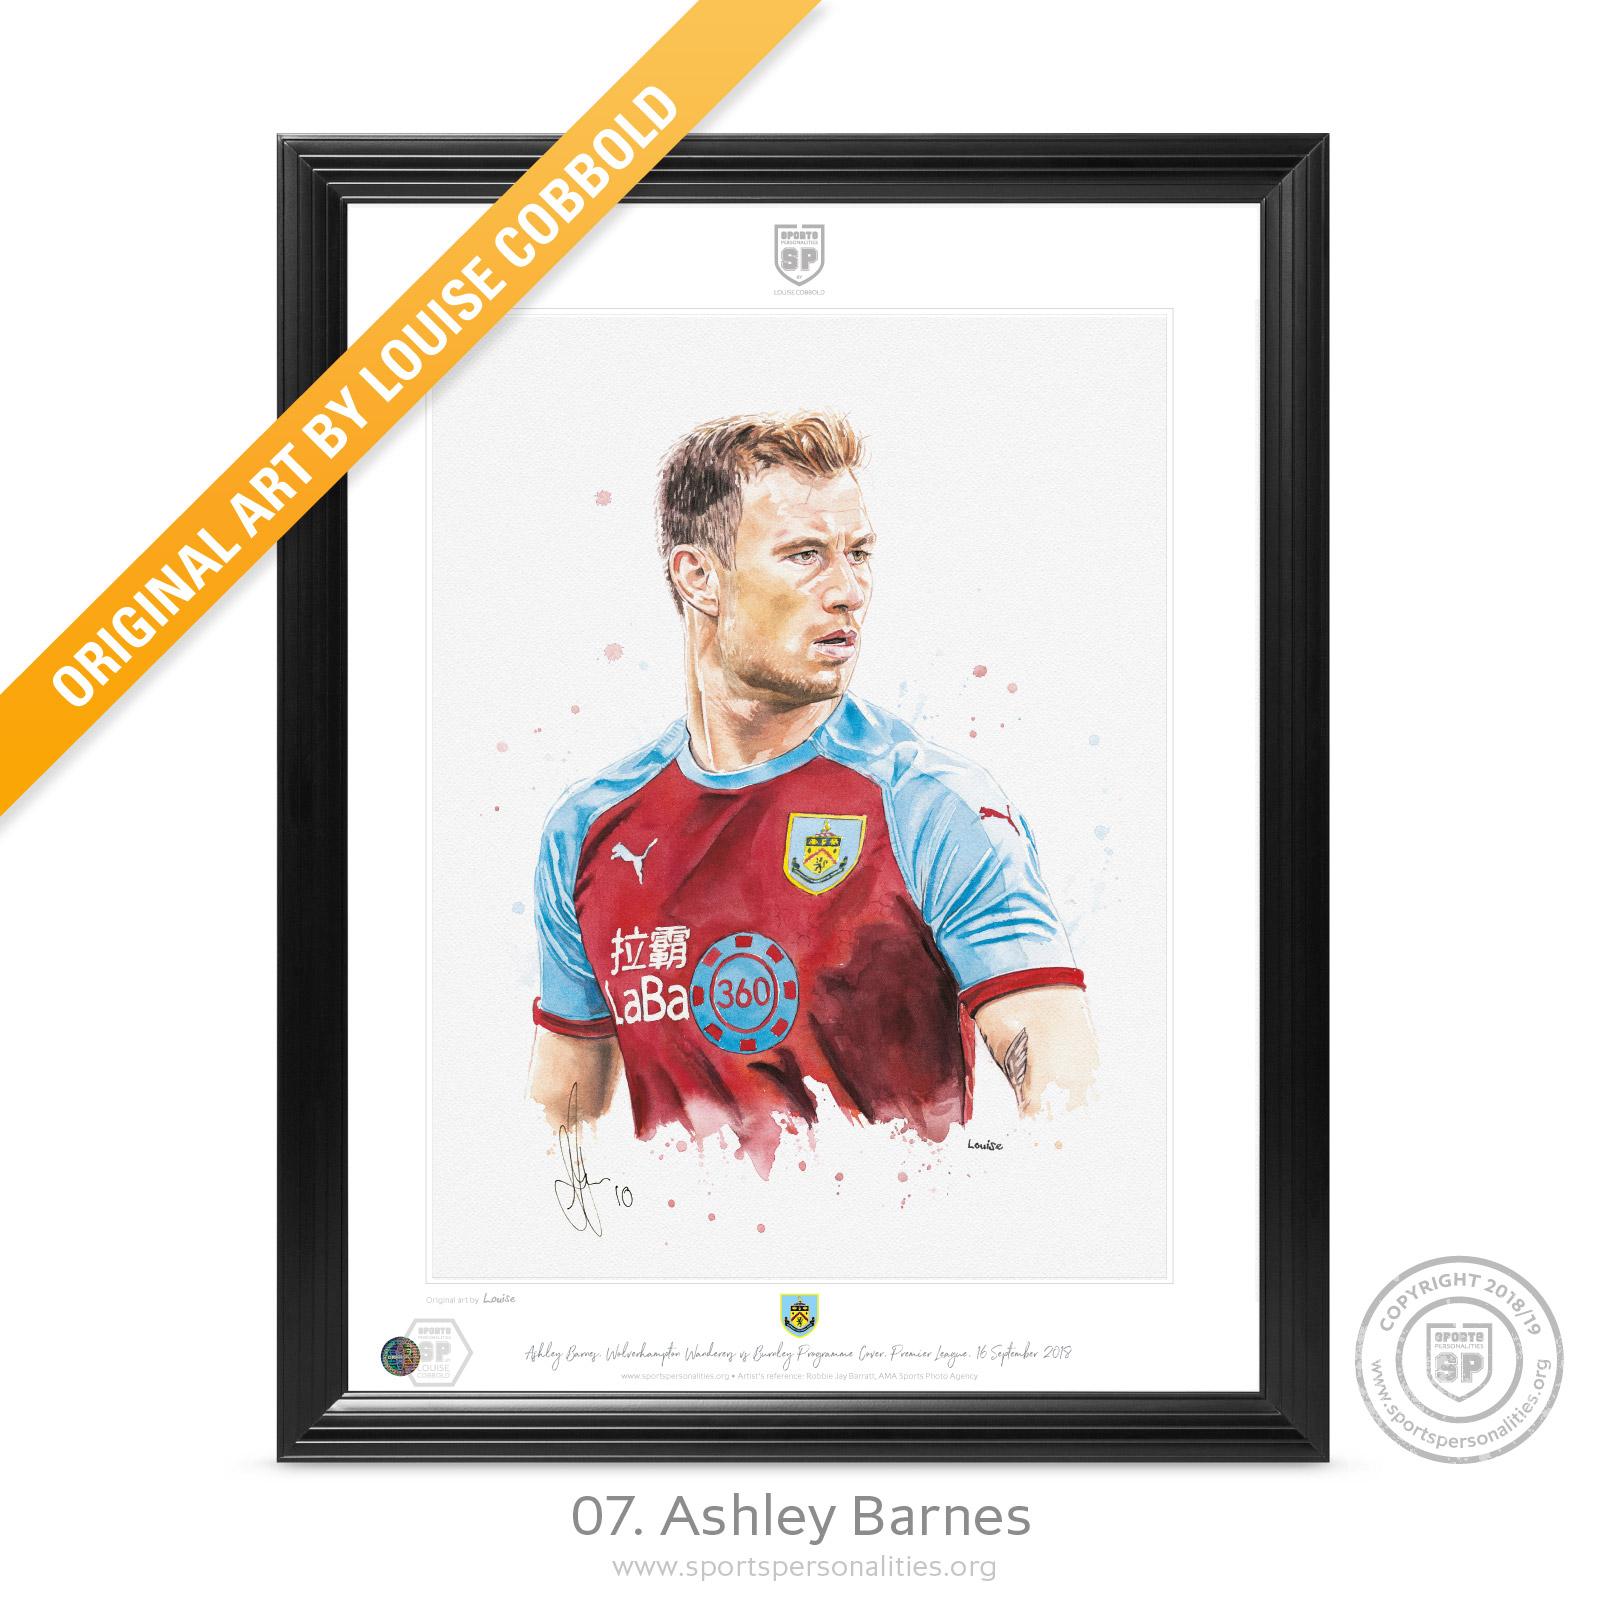 2018_19-SP_Auction_07._Ashley_Barnes.jpg